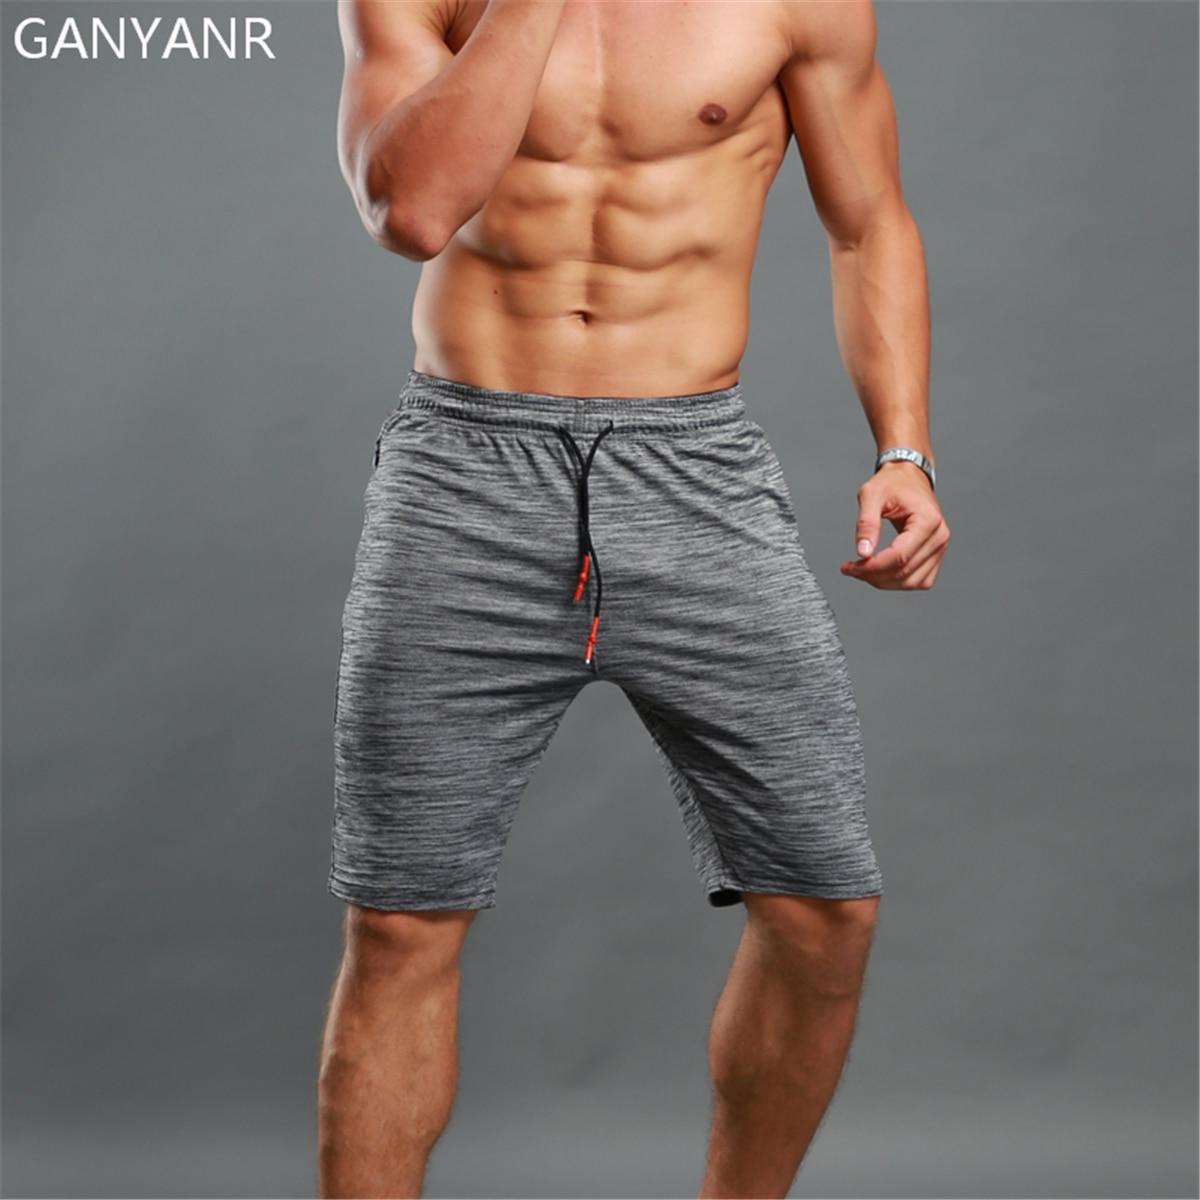 Running Running Shorts Ganyanr Brand Running Shorts Men Basketball Gym Athletic Leggings Short Pants Sports Tennis Crossfit Football Volleyball Fitness